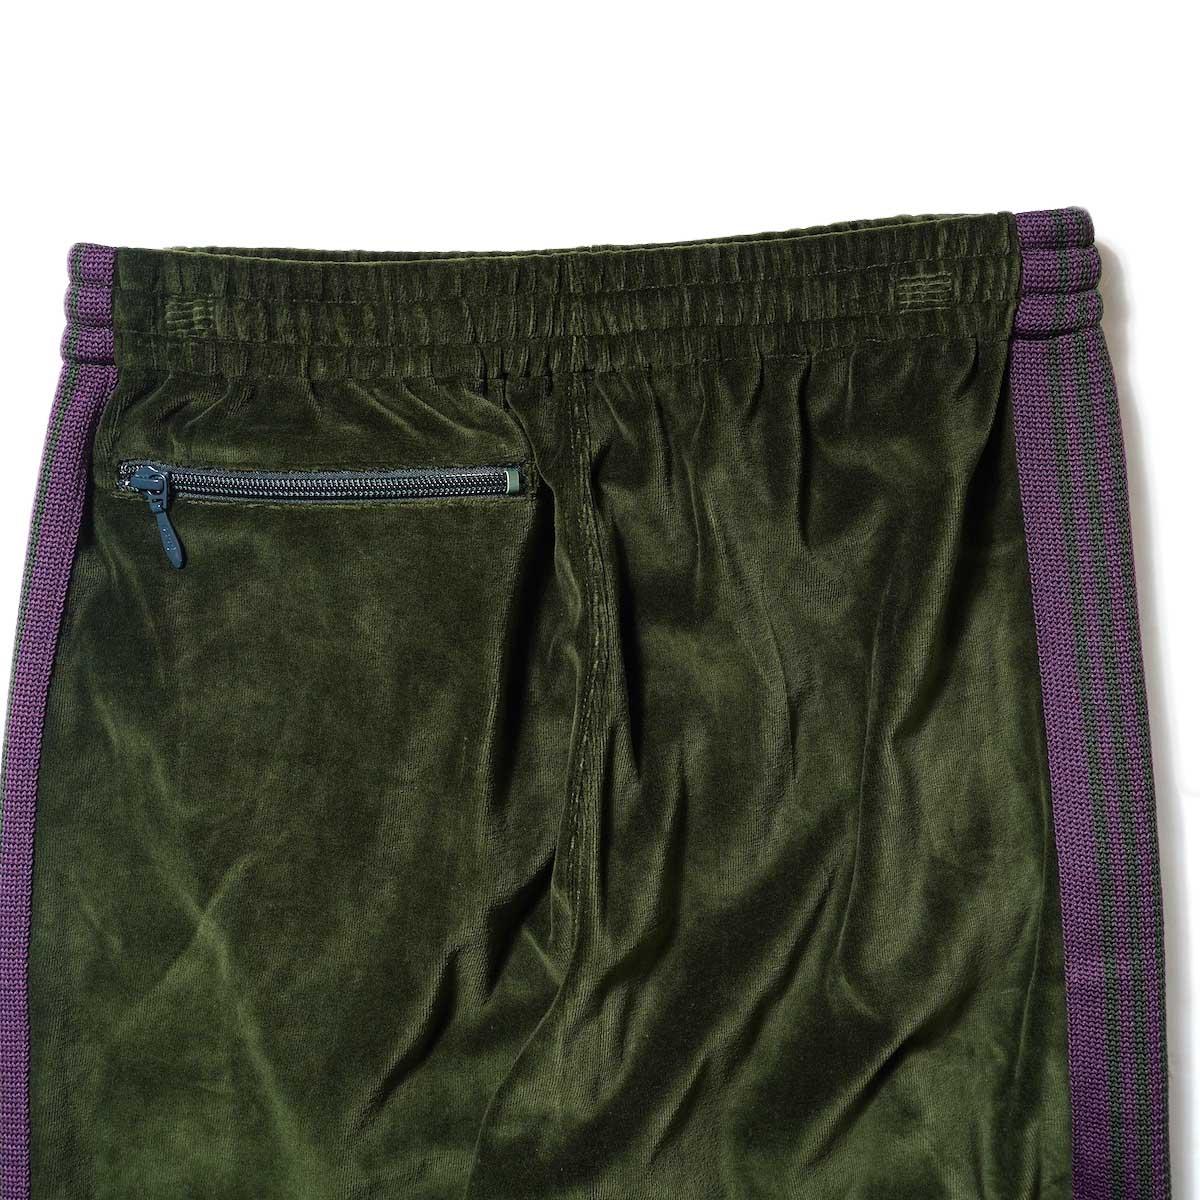 Needles / NARROW TRACK PANT - C/PE VELOUR (Green)ヒップポケット